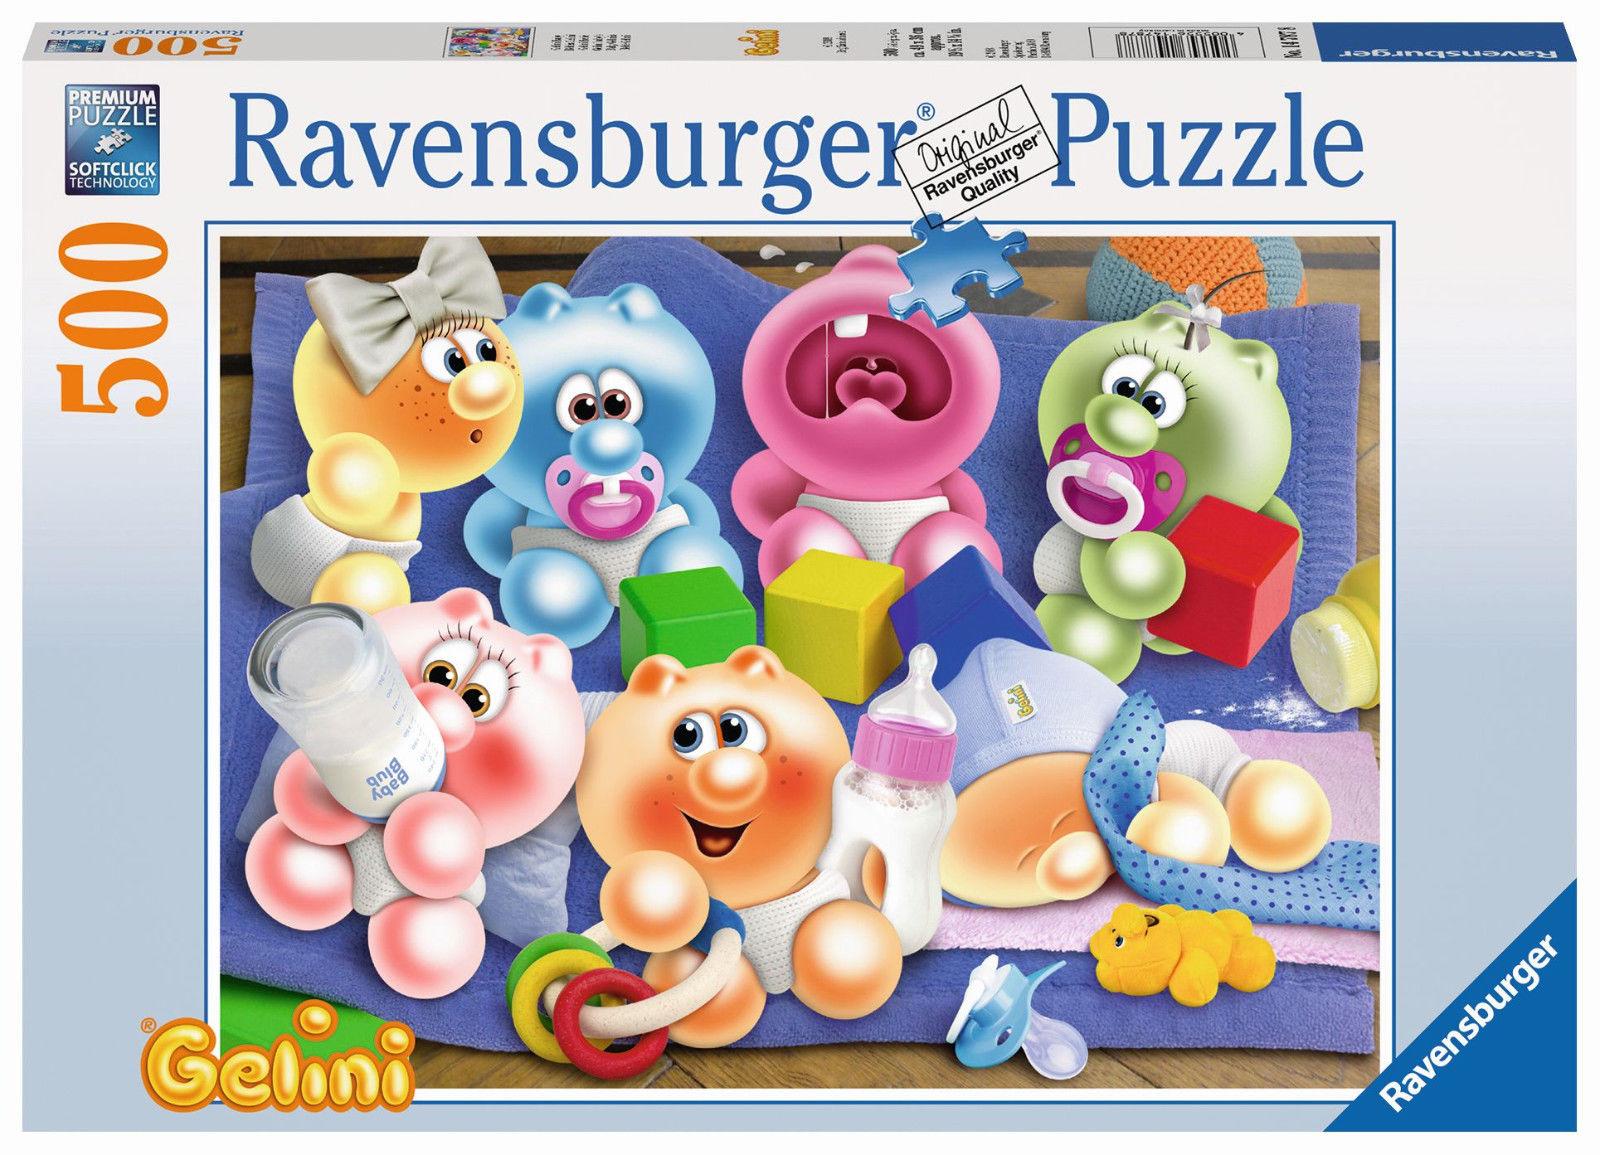 RAVENSBURGER 14787 - GELINI BABY, 500 TEILE PUZZLE, NEU/OVP, VORVERKAUF